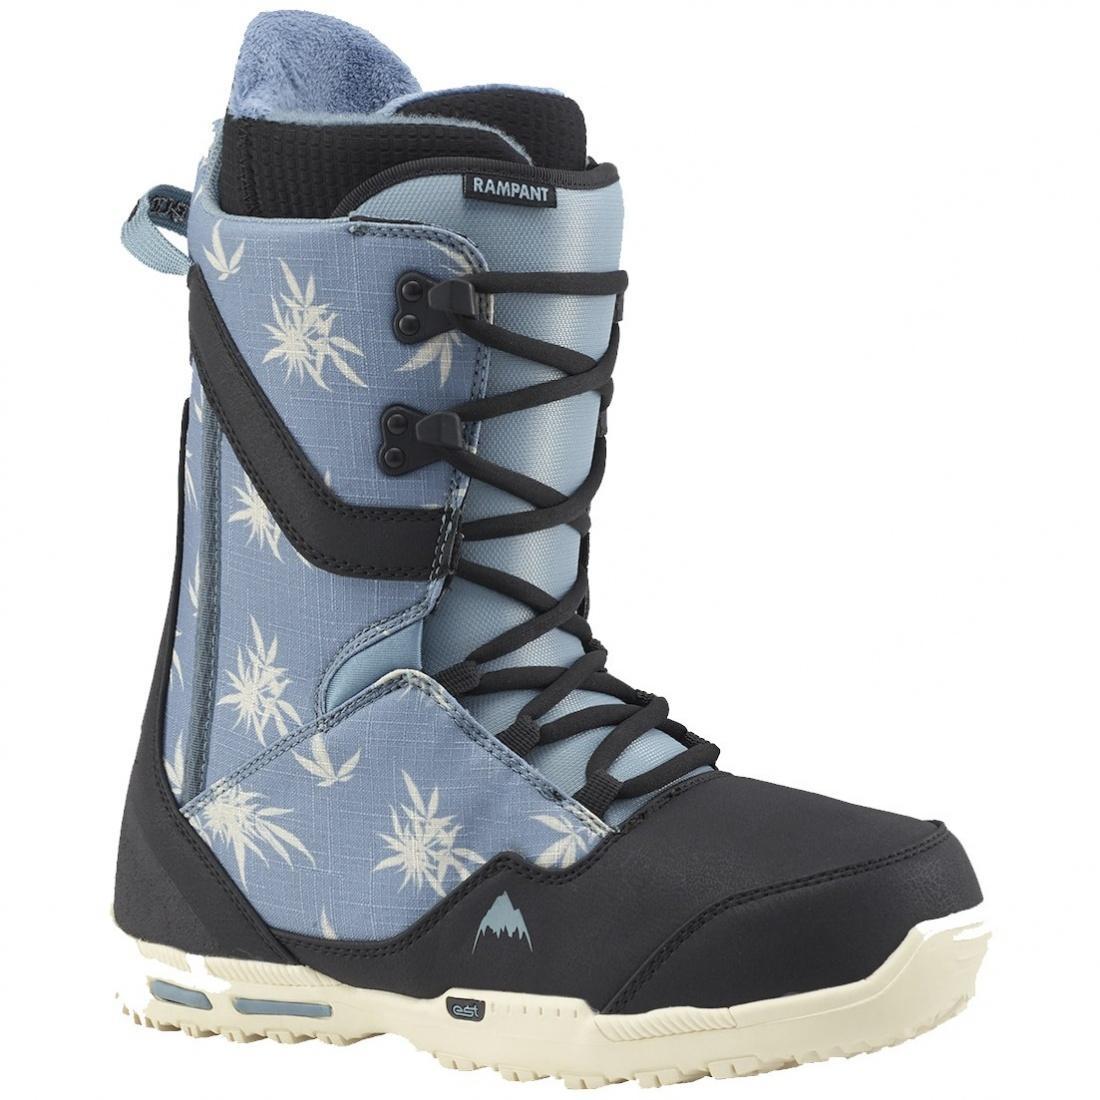 Ботинки для сноуборда Burton Rampant купить в Boardshop №1